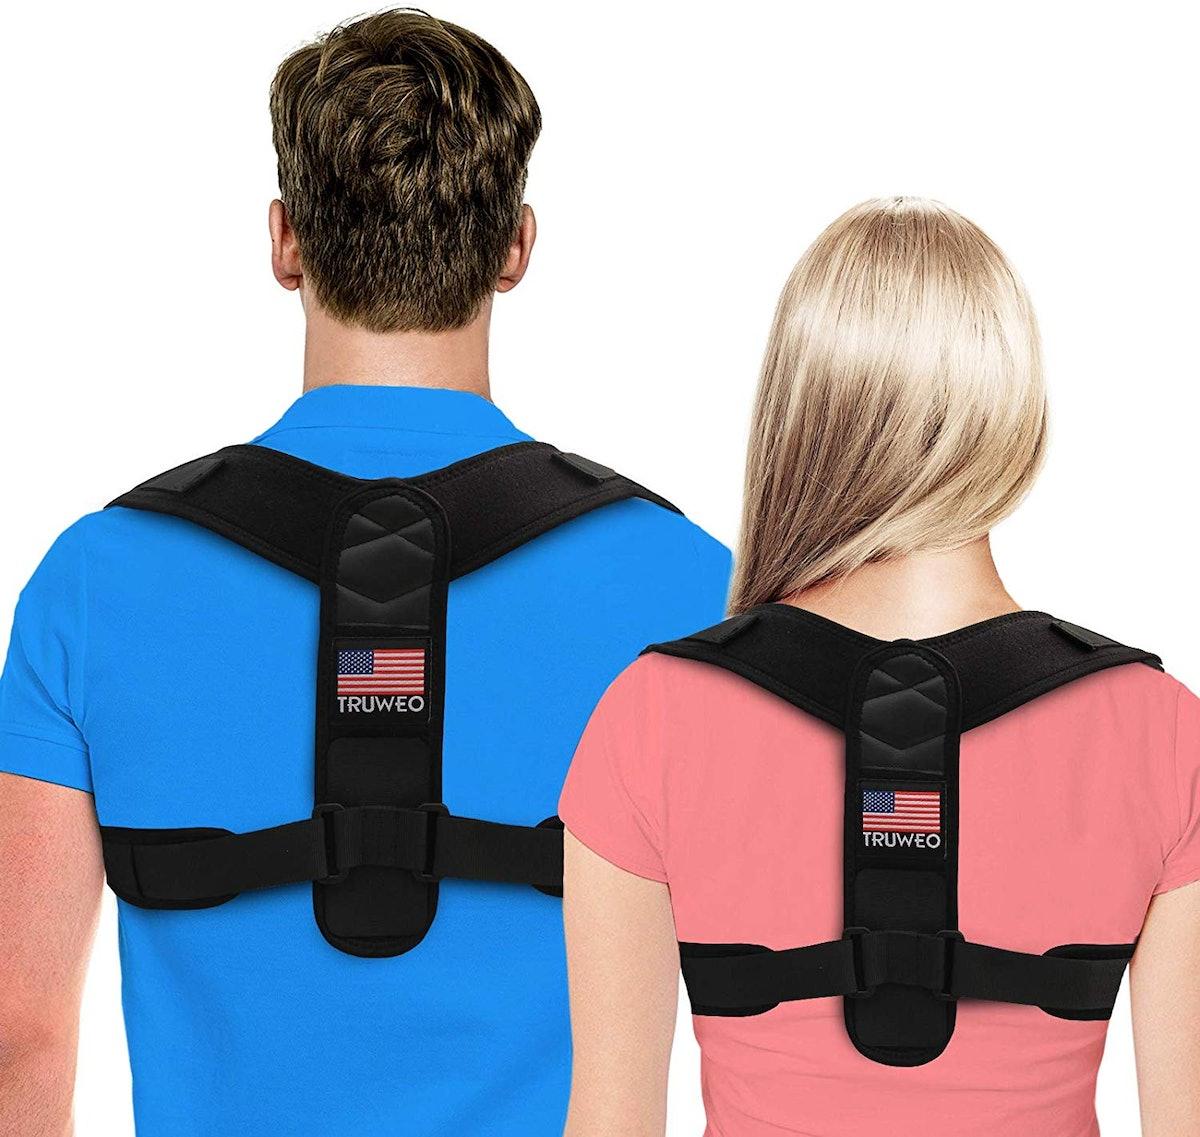 Truweo Posture Corrector Brace